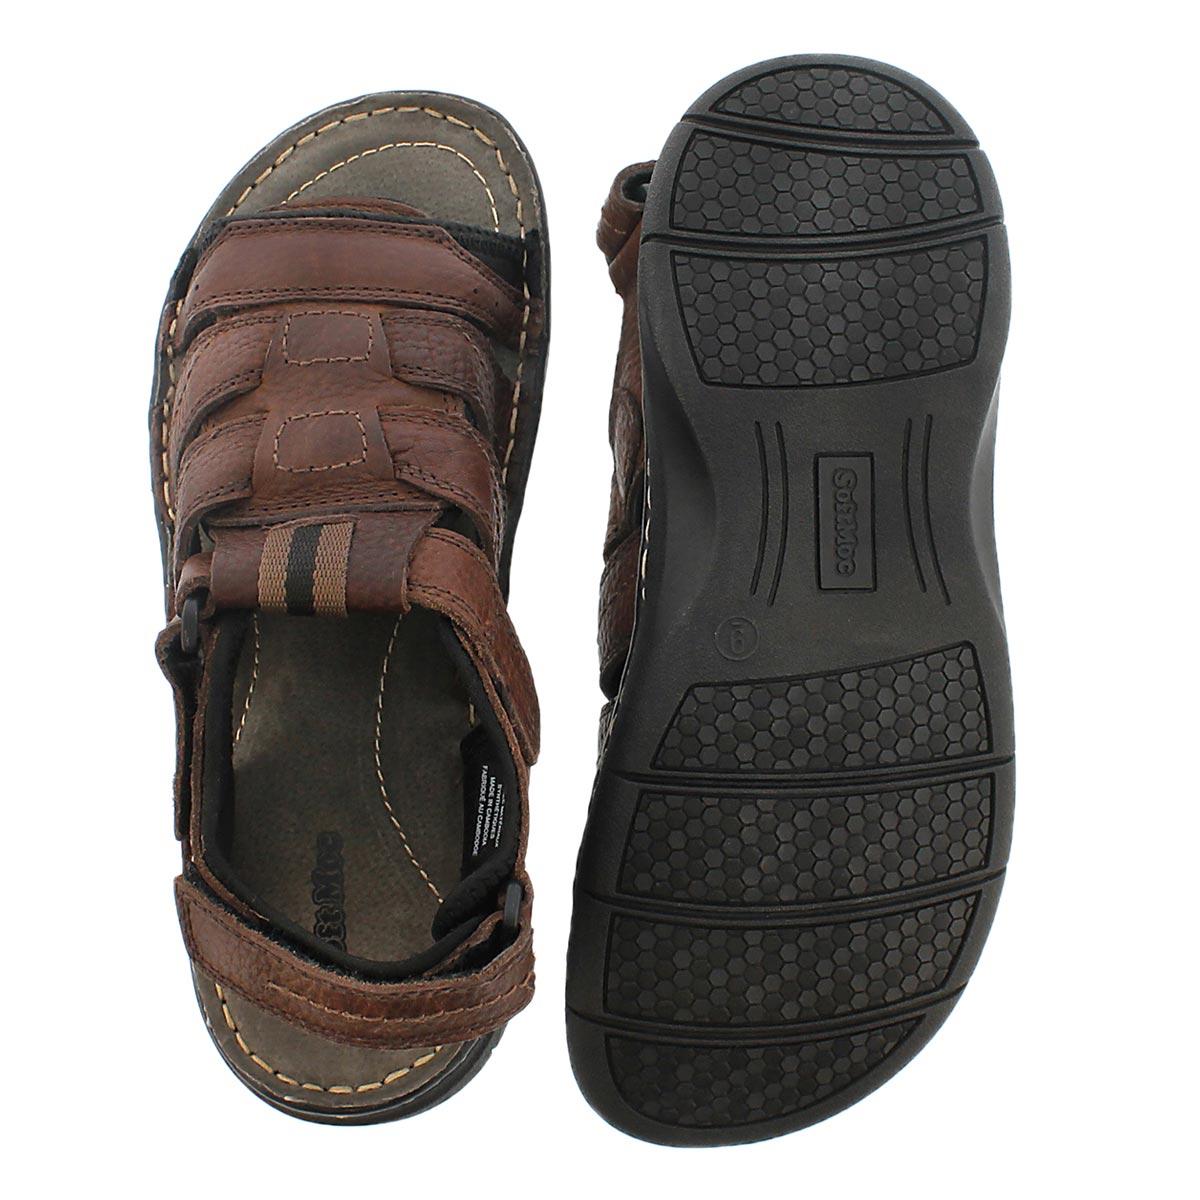 Sandale pêcheur COLIN 3, brun, hommes